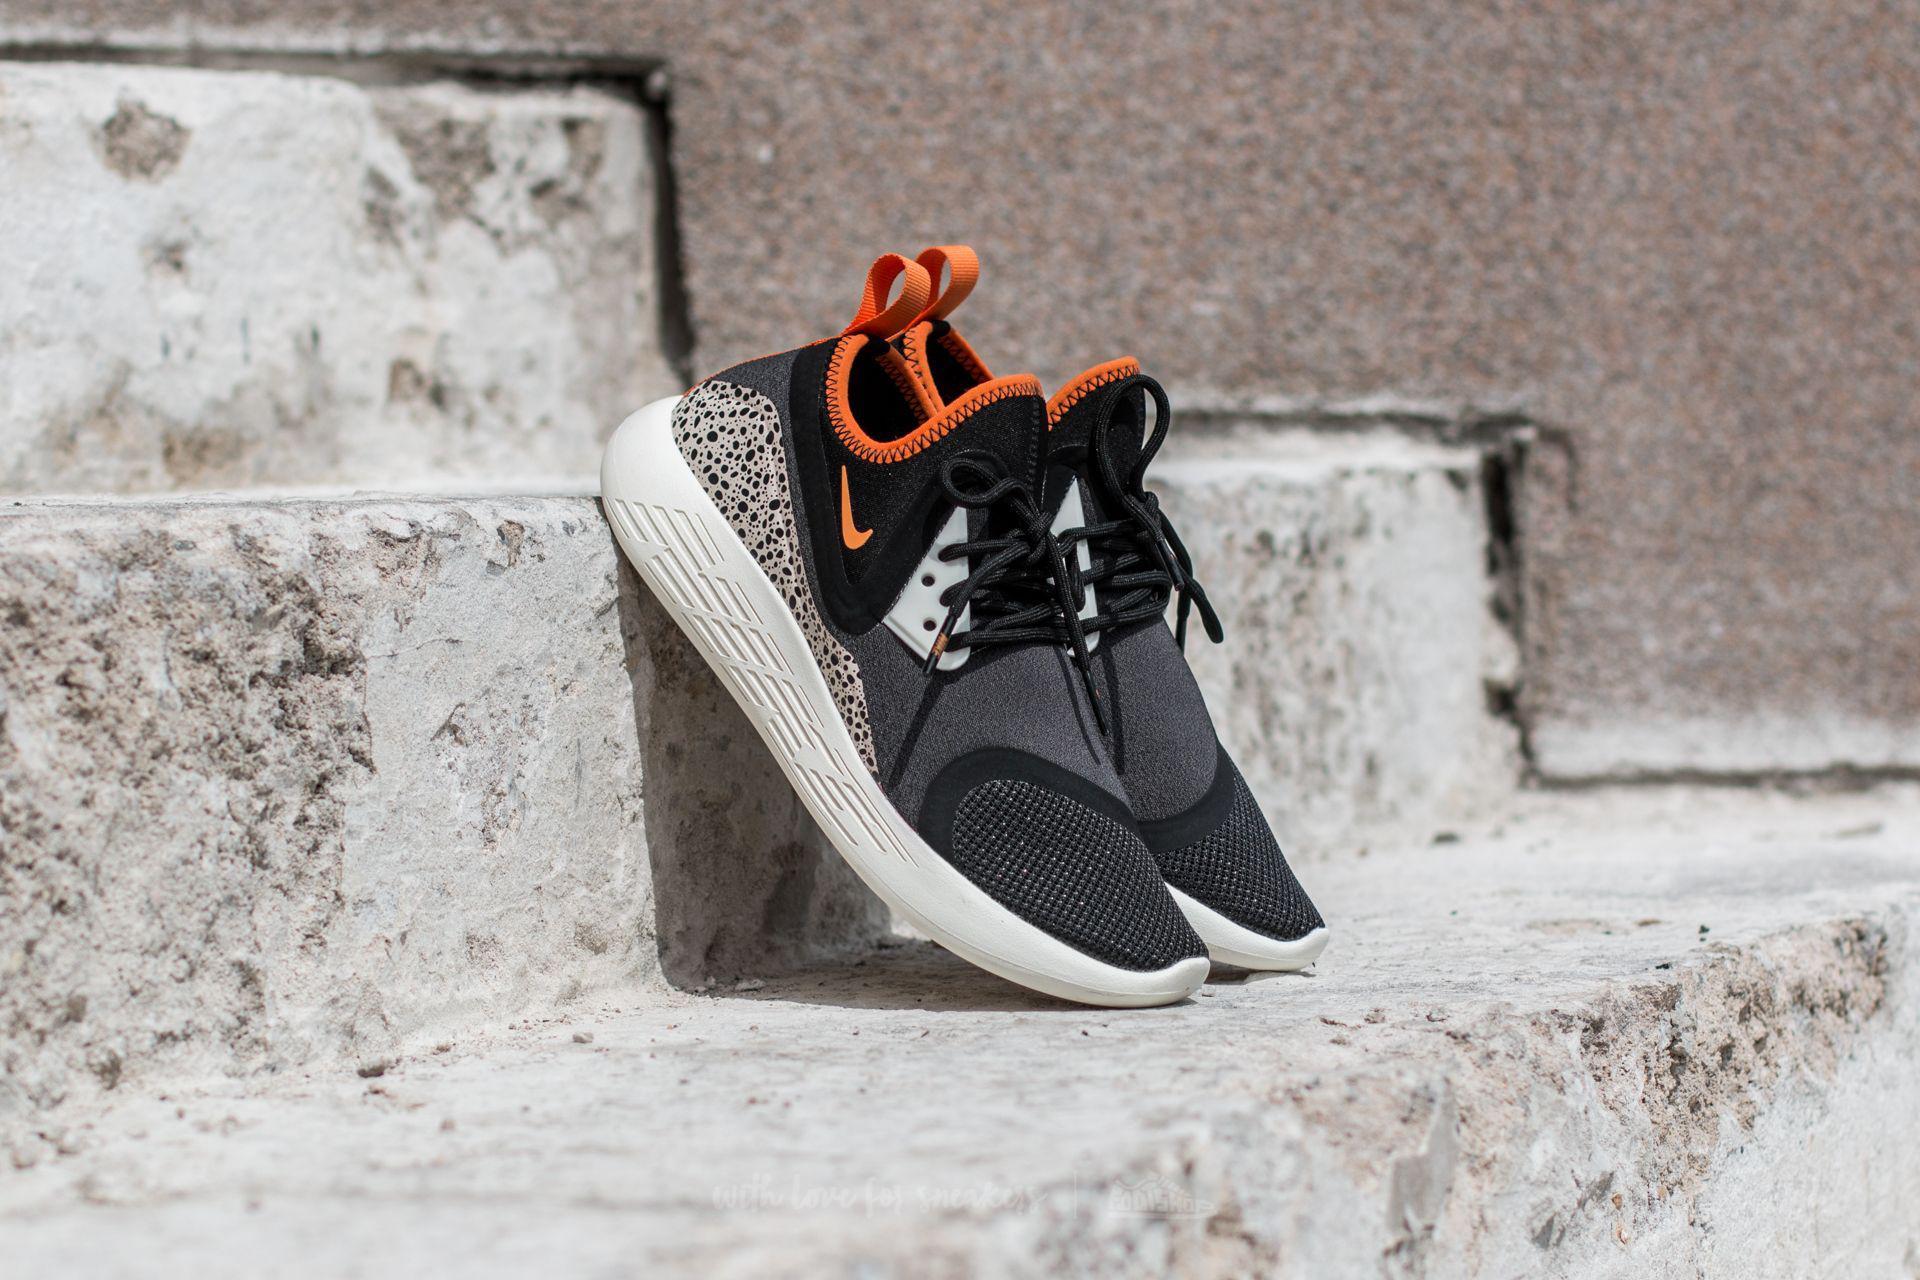 9d3c737c3007 Lyst - Nike Wmns Lunarcharge Bn Black  Clay Orange-sail